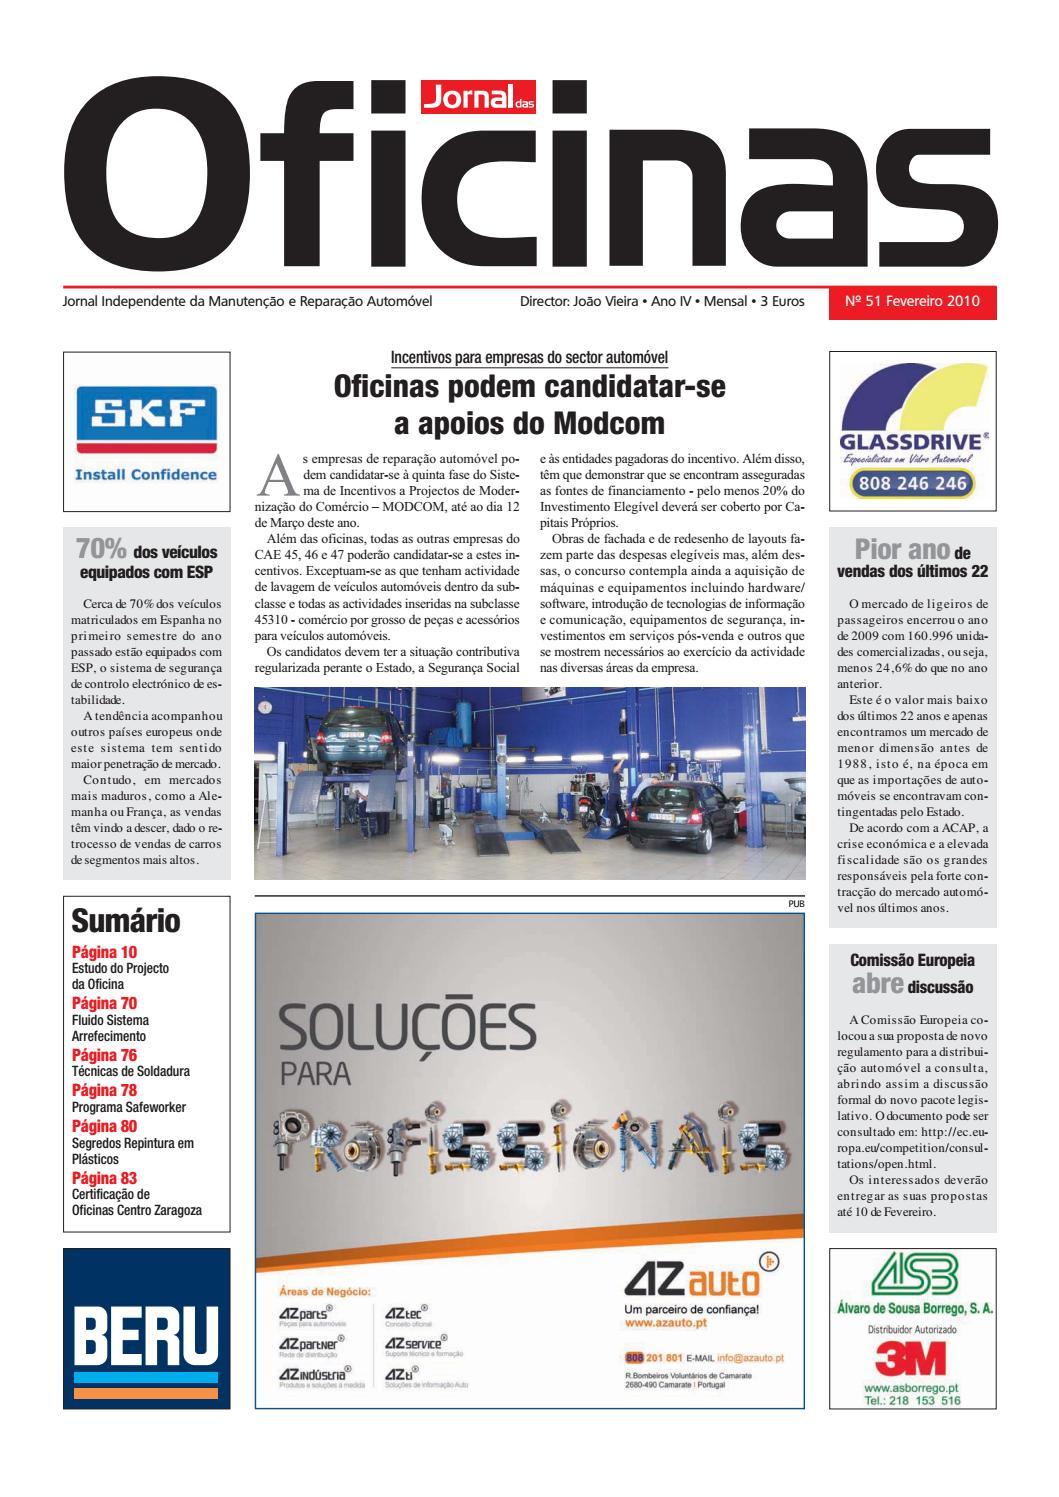 664b593f6 Jo051lr by Jornal das Oficinas - issuu